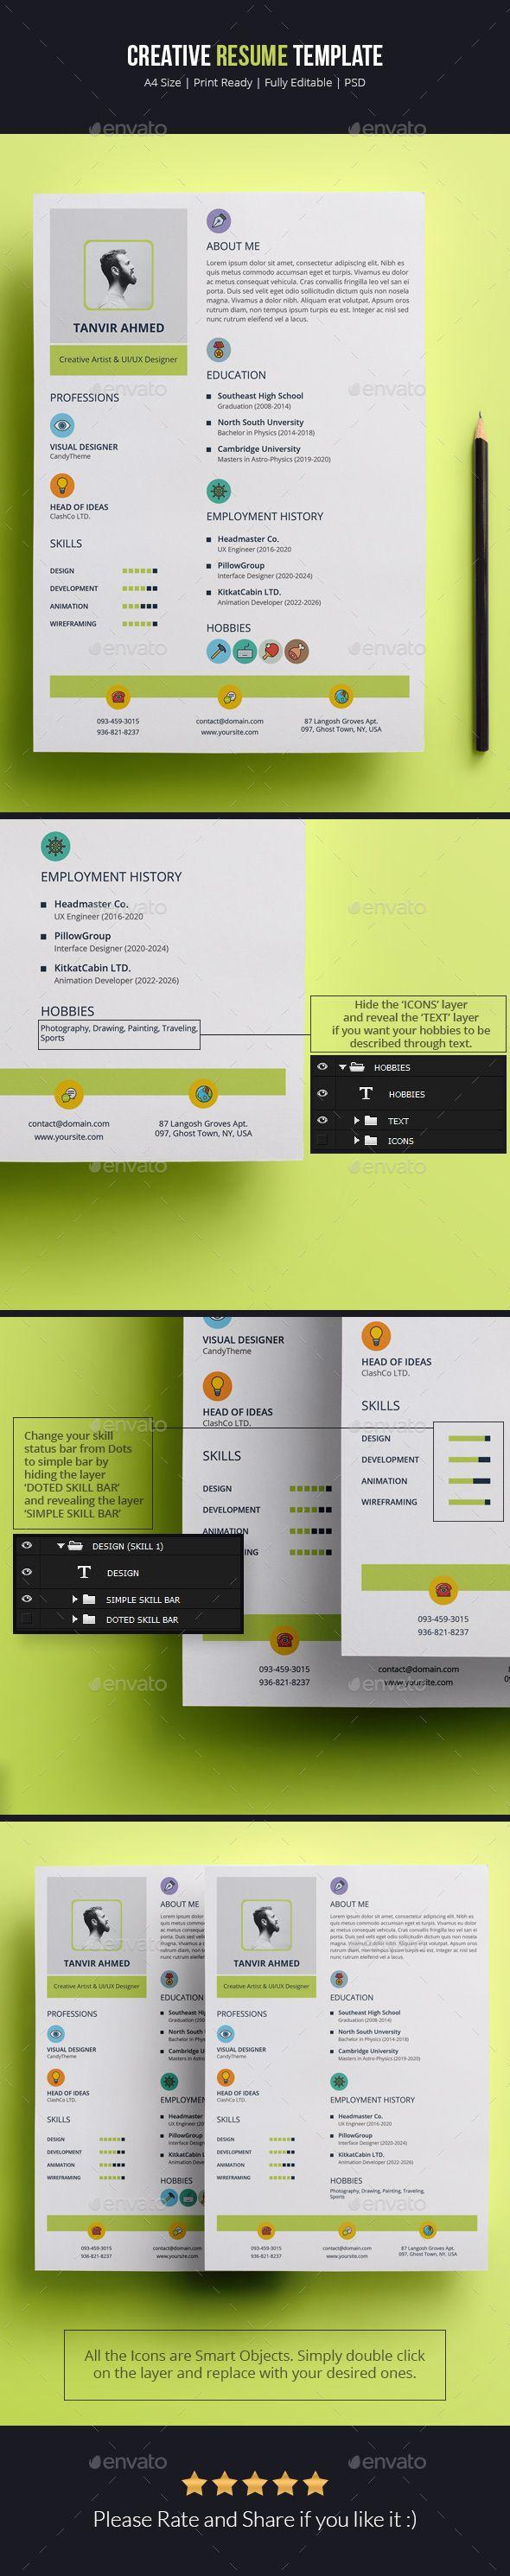 Creative Resume Template Creative Resume Templates